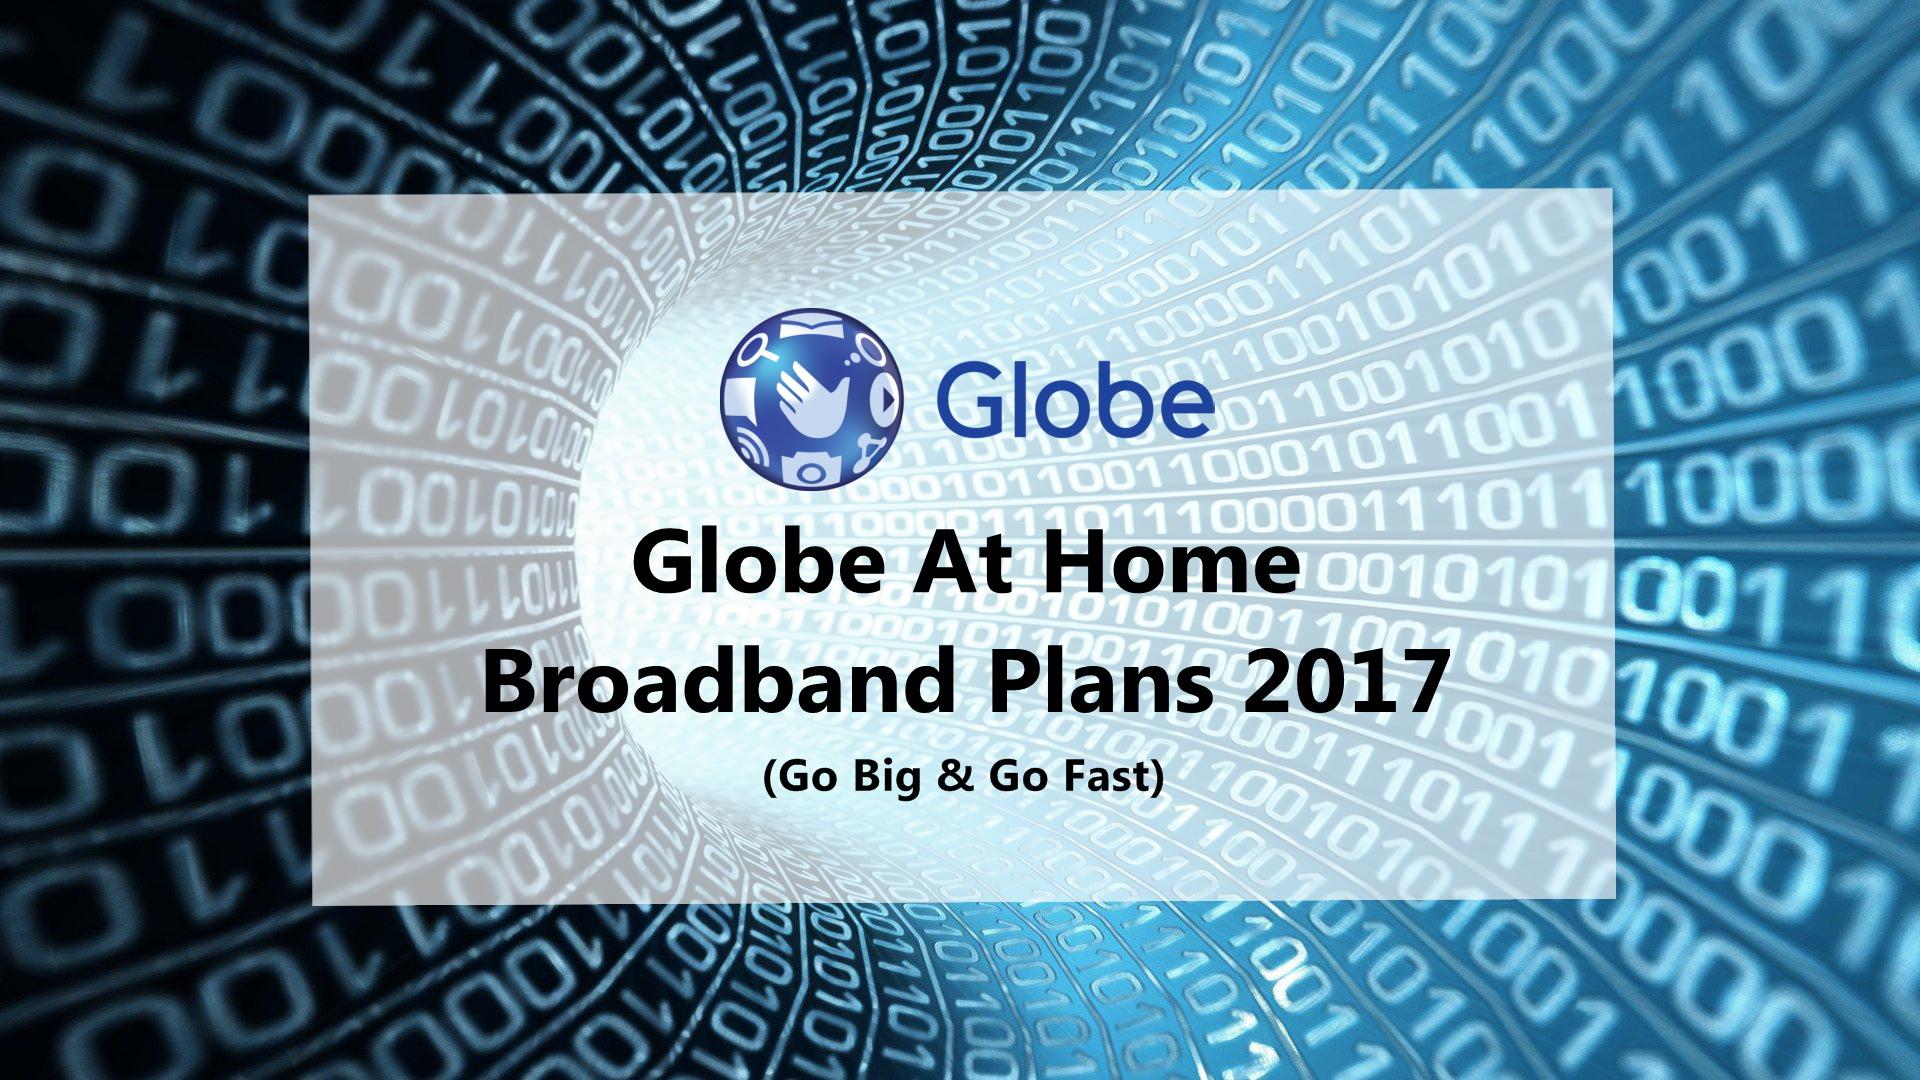 Globe At Home Broadband Plans 2017